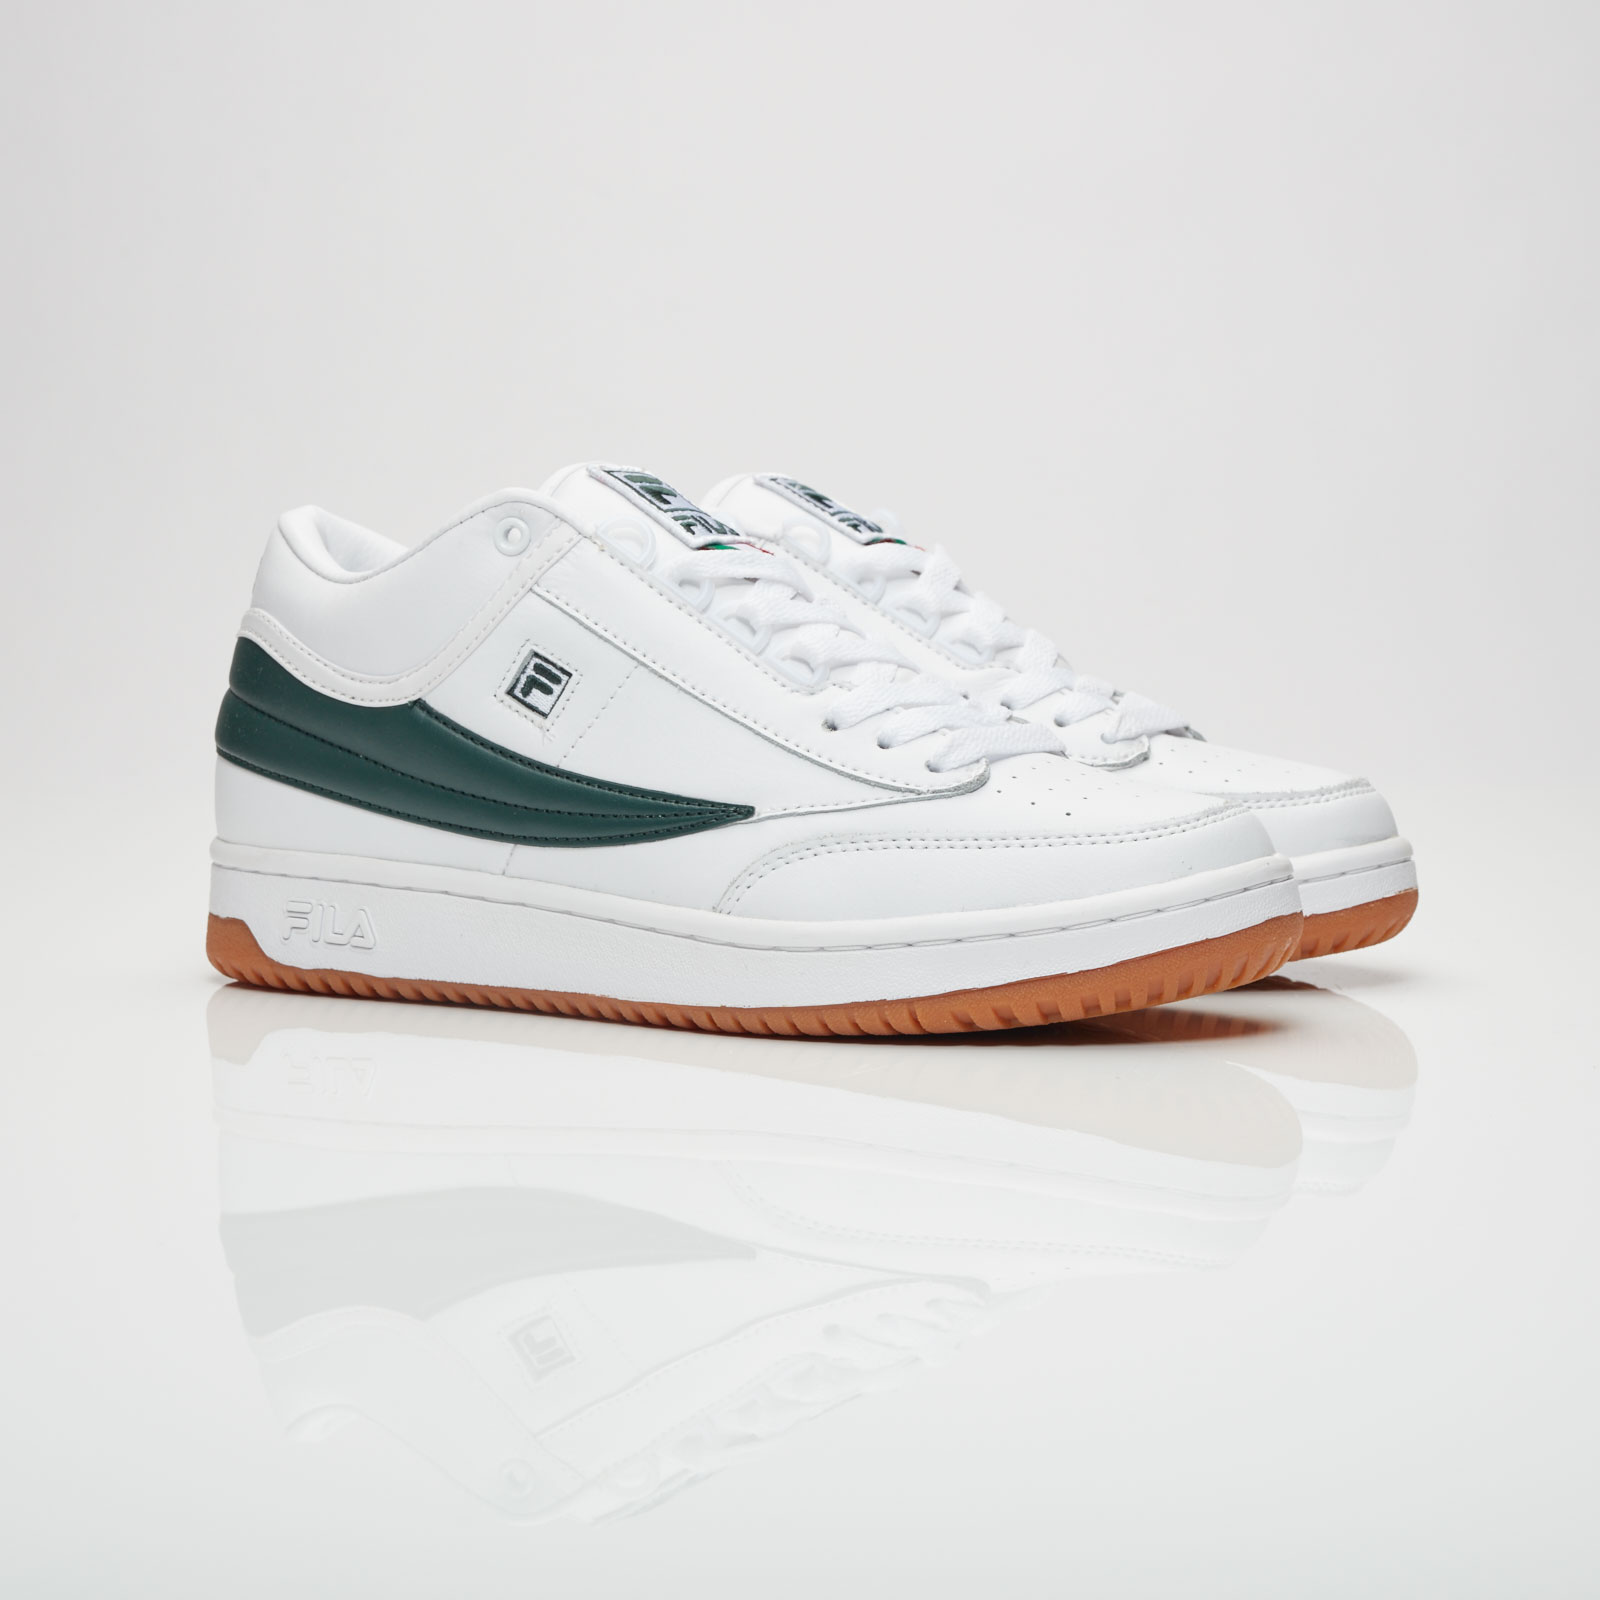 Fila T1 Mid - 1vt13066-142 - Sneakersnstuff | sneakers ...